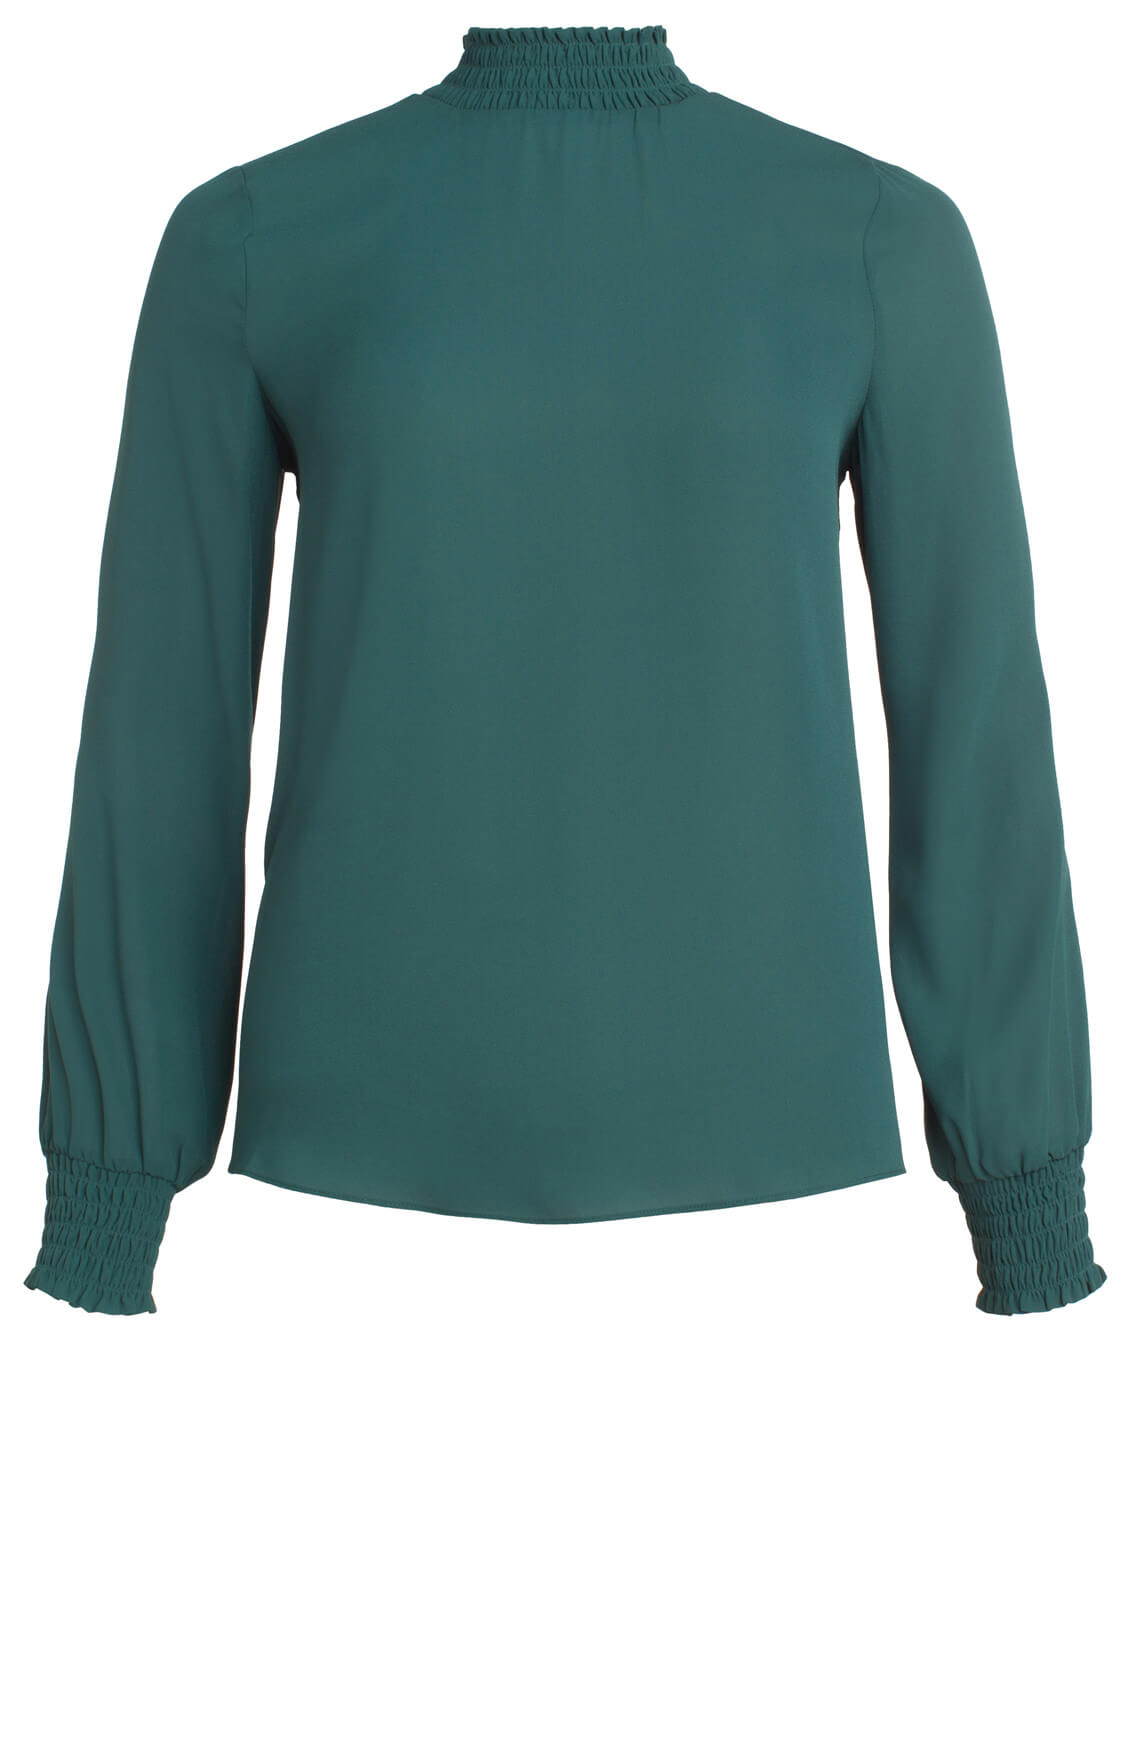 Kocca Dames Donald blouse groen